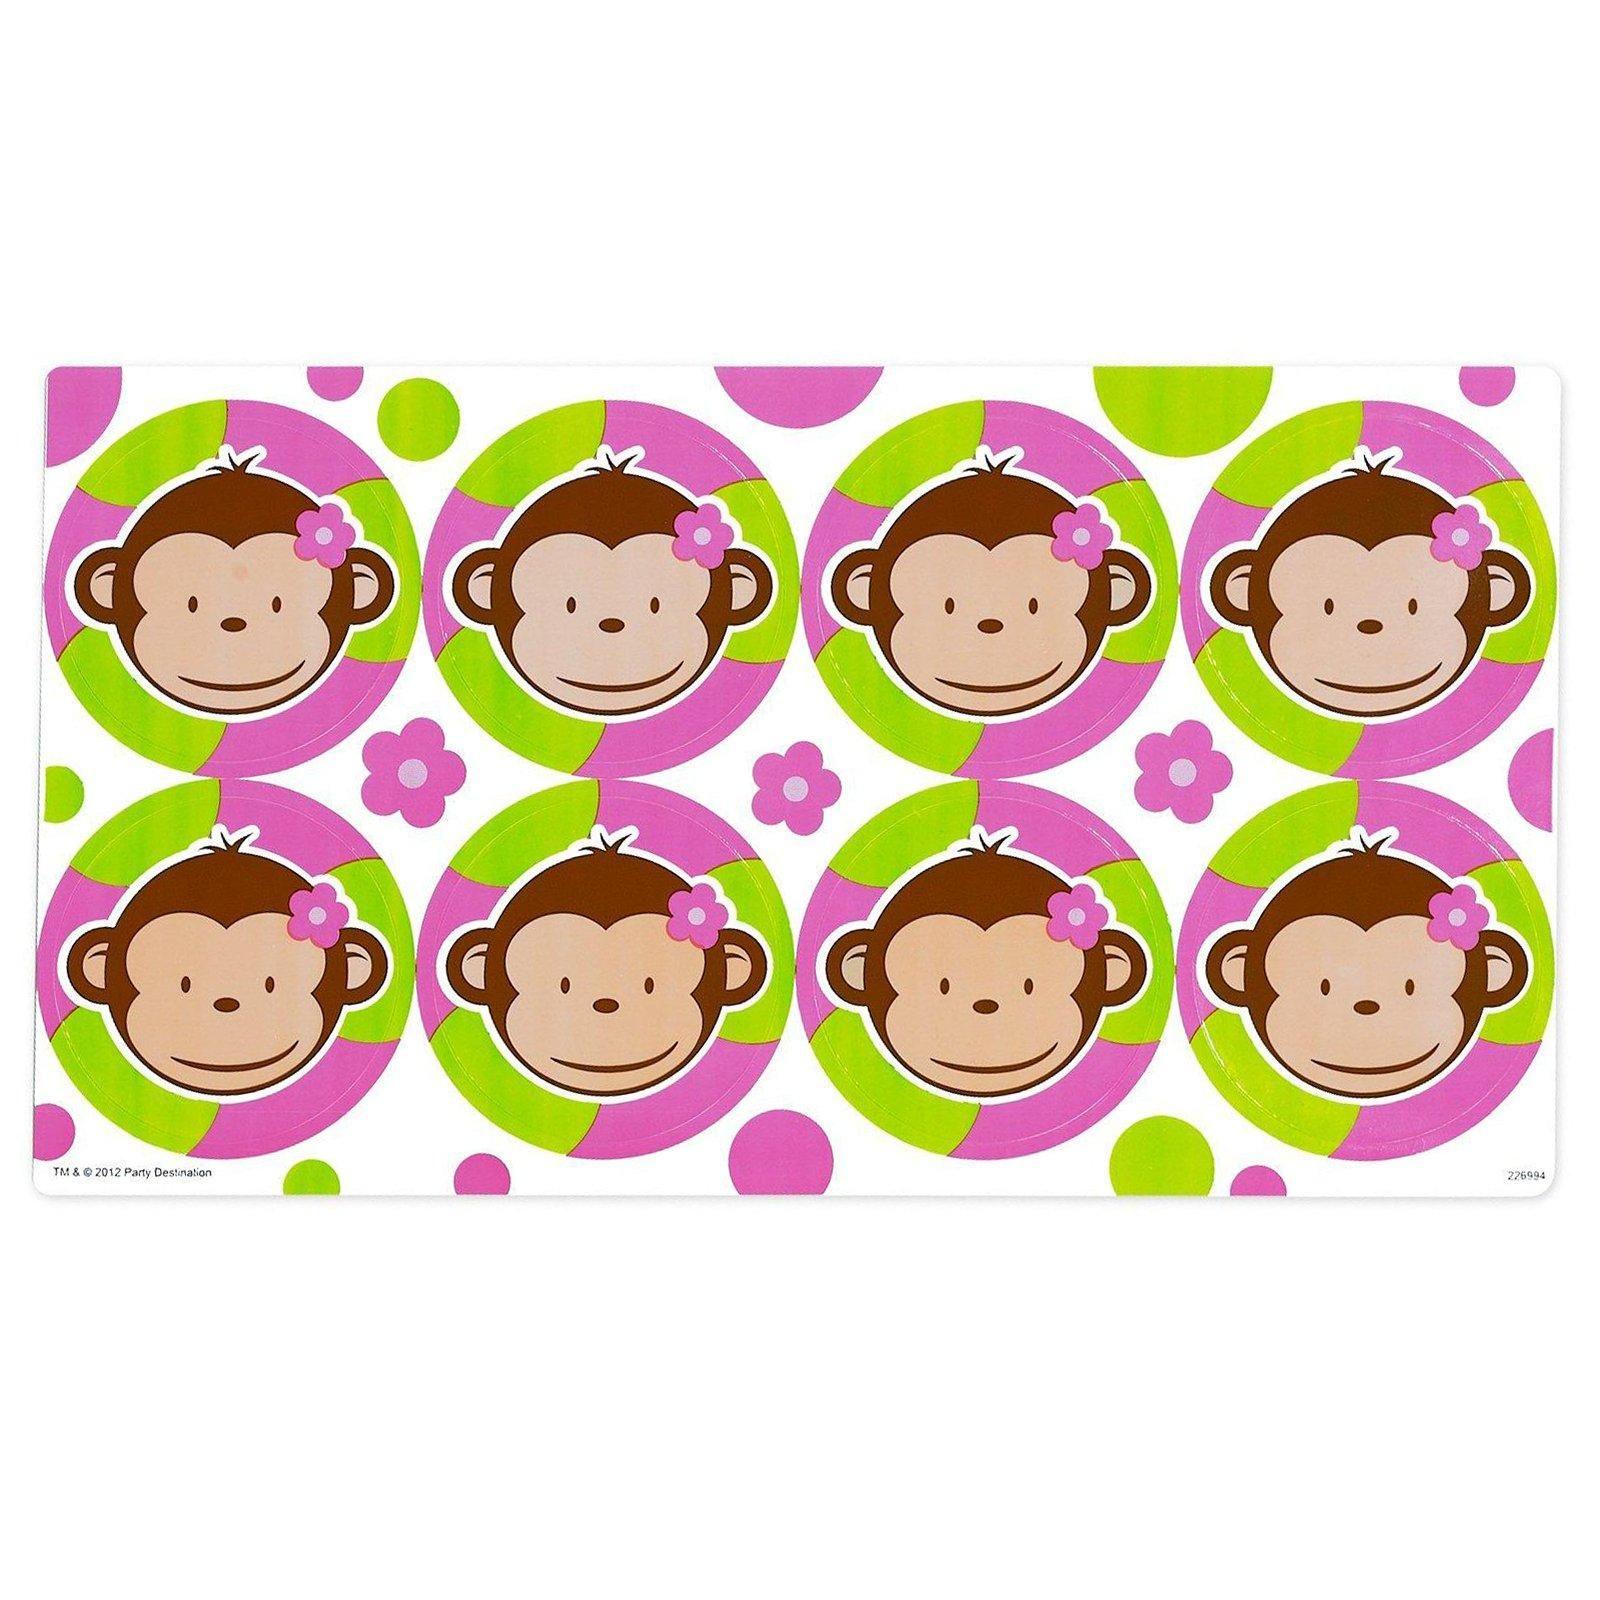 Pink Mod Monkey Large Lollipop Sticker Sheet from BirthdayExpress.com